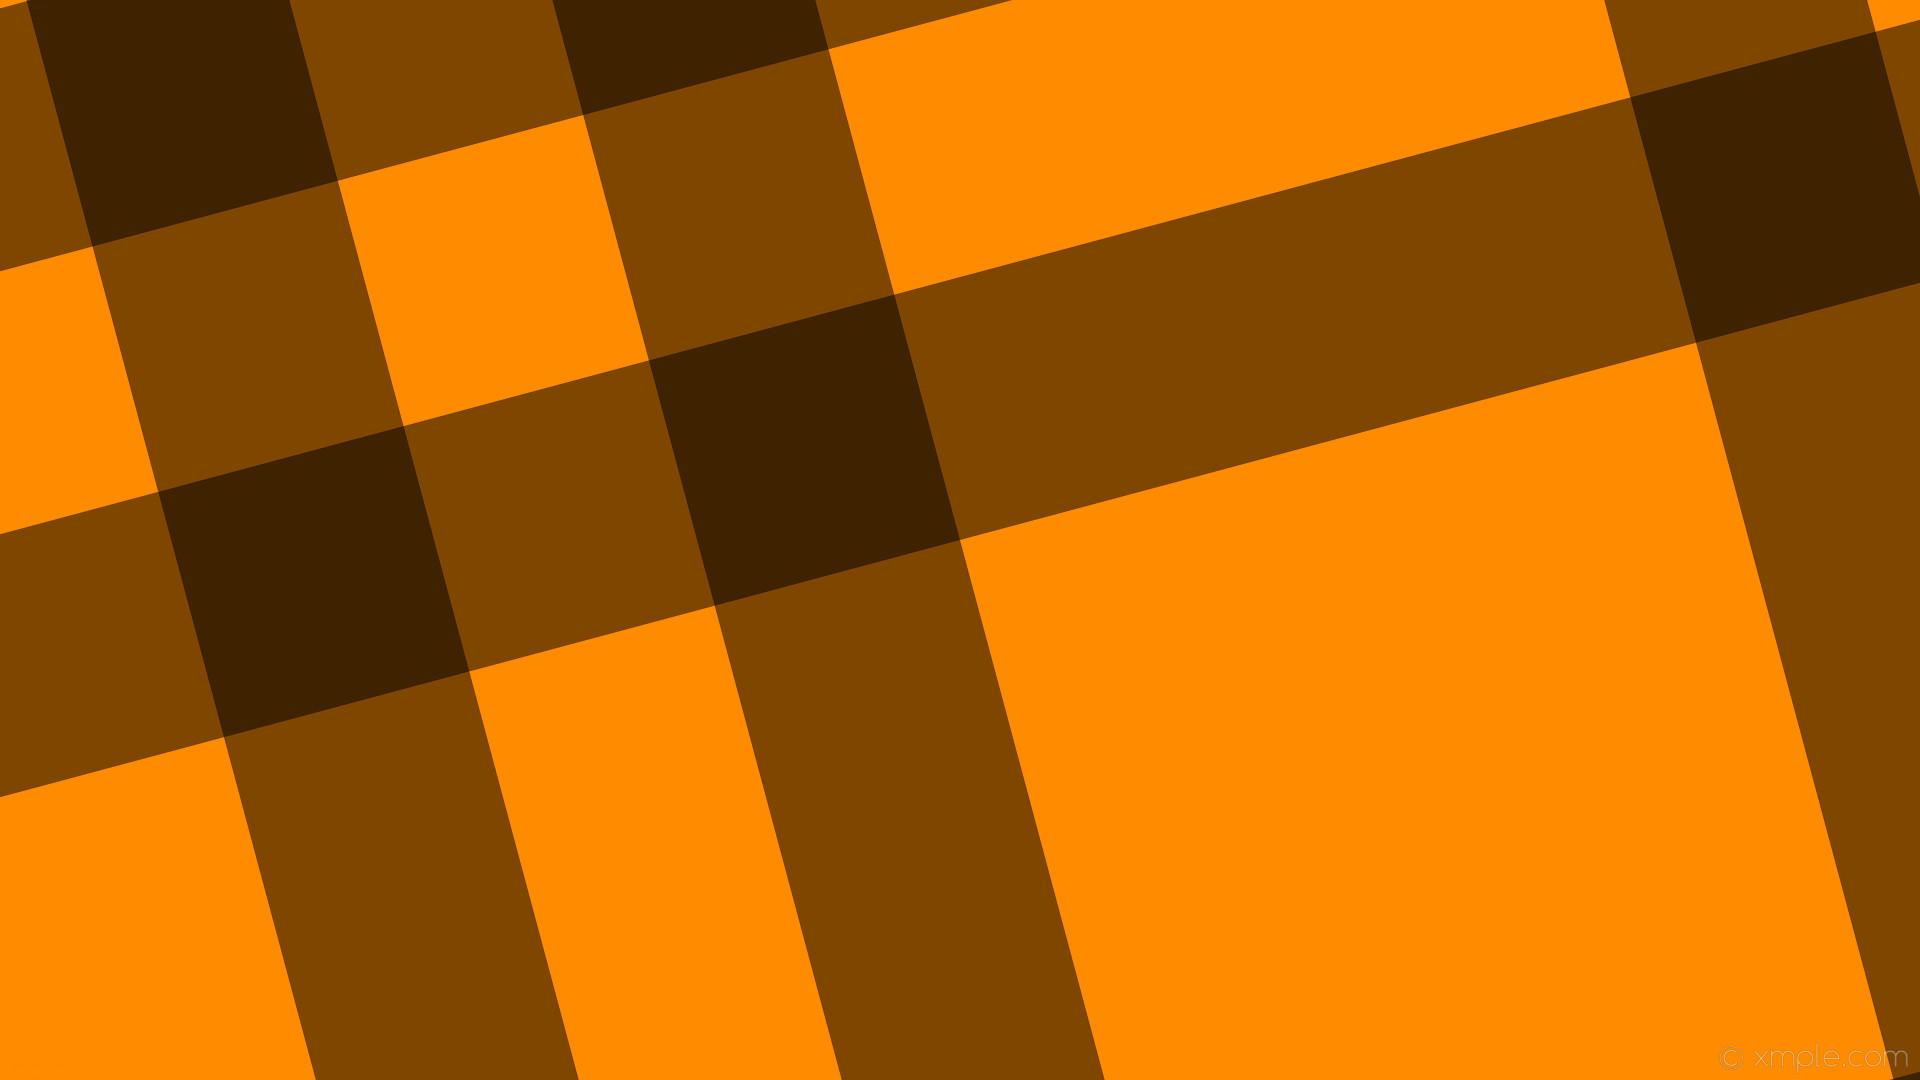 black and orange wallpaper 74 images